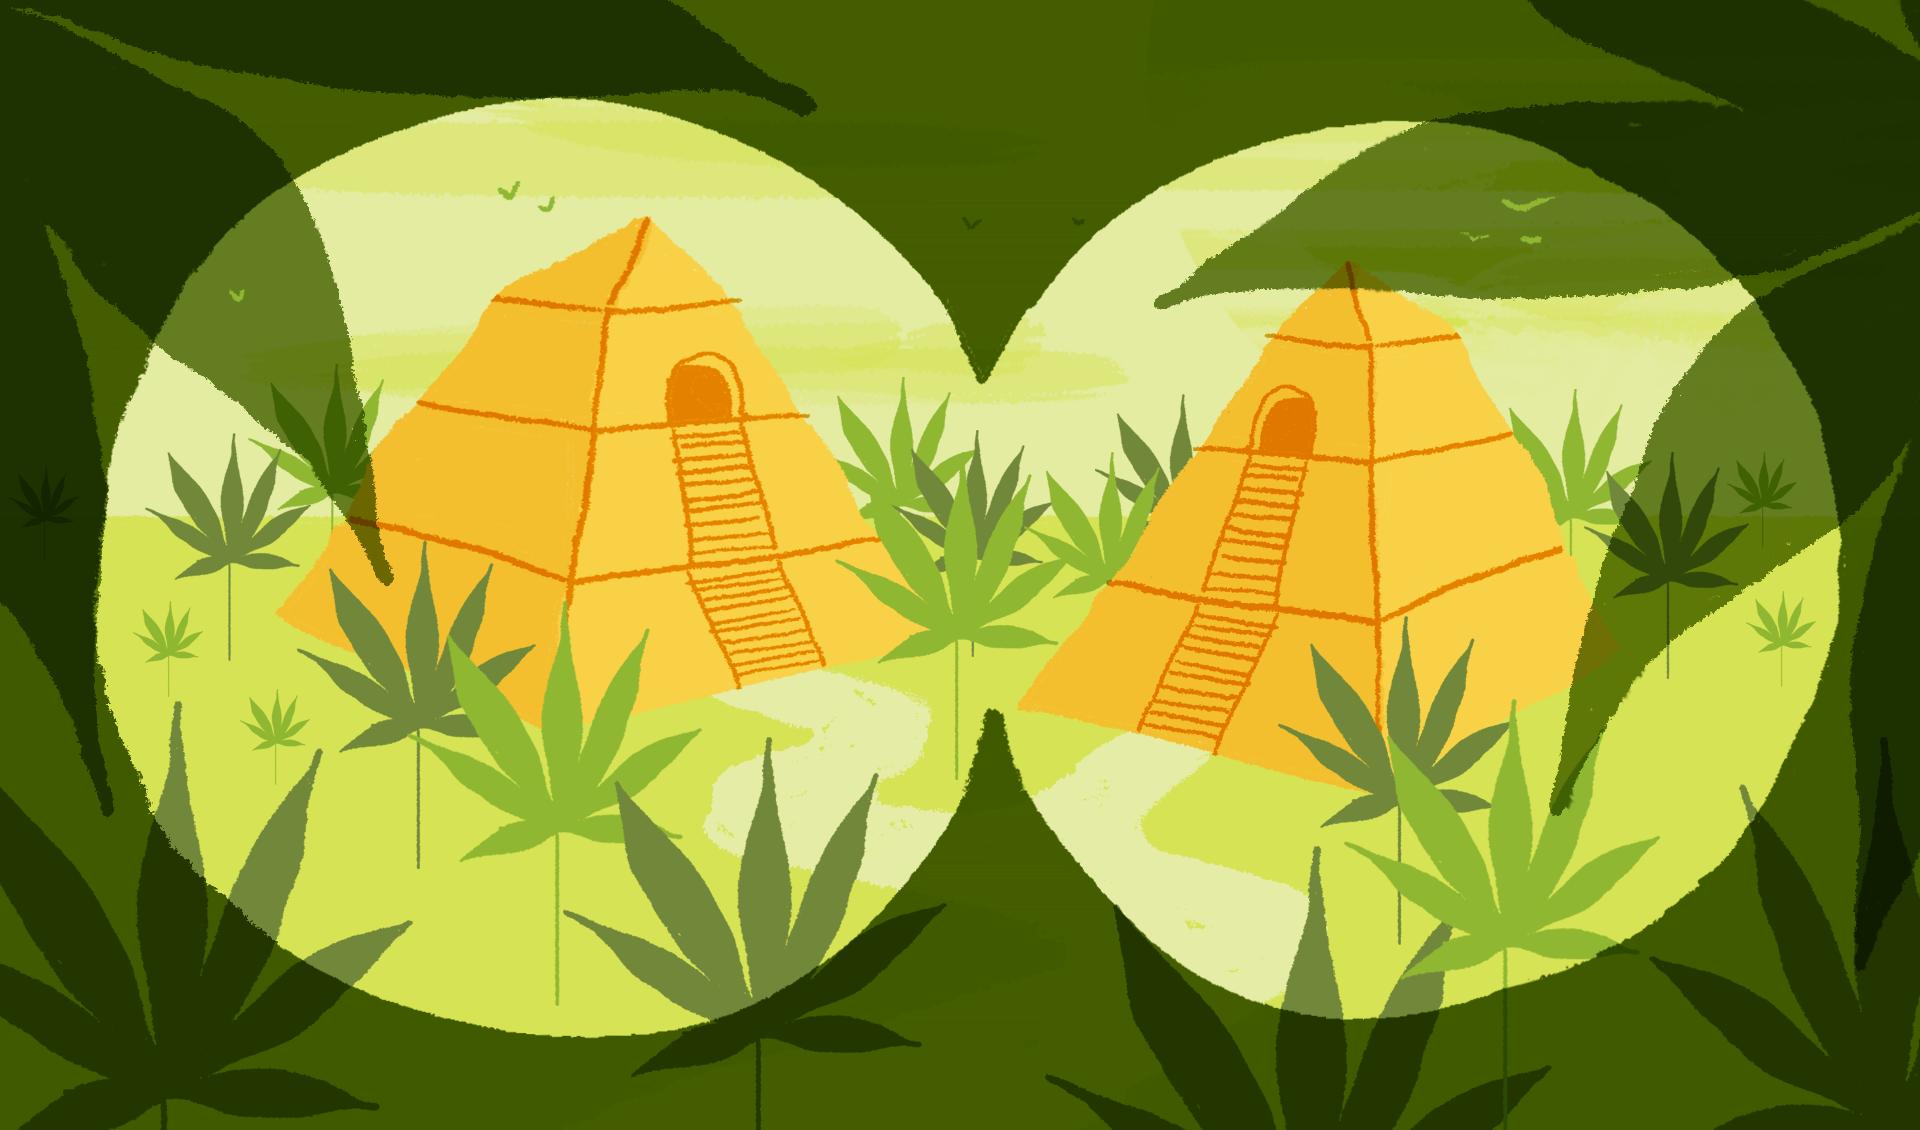 Marques-de-cannabis-weed-branding-illustration-antoine-peltier